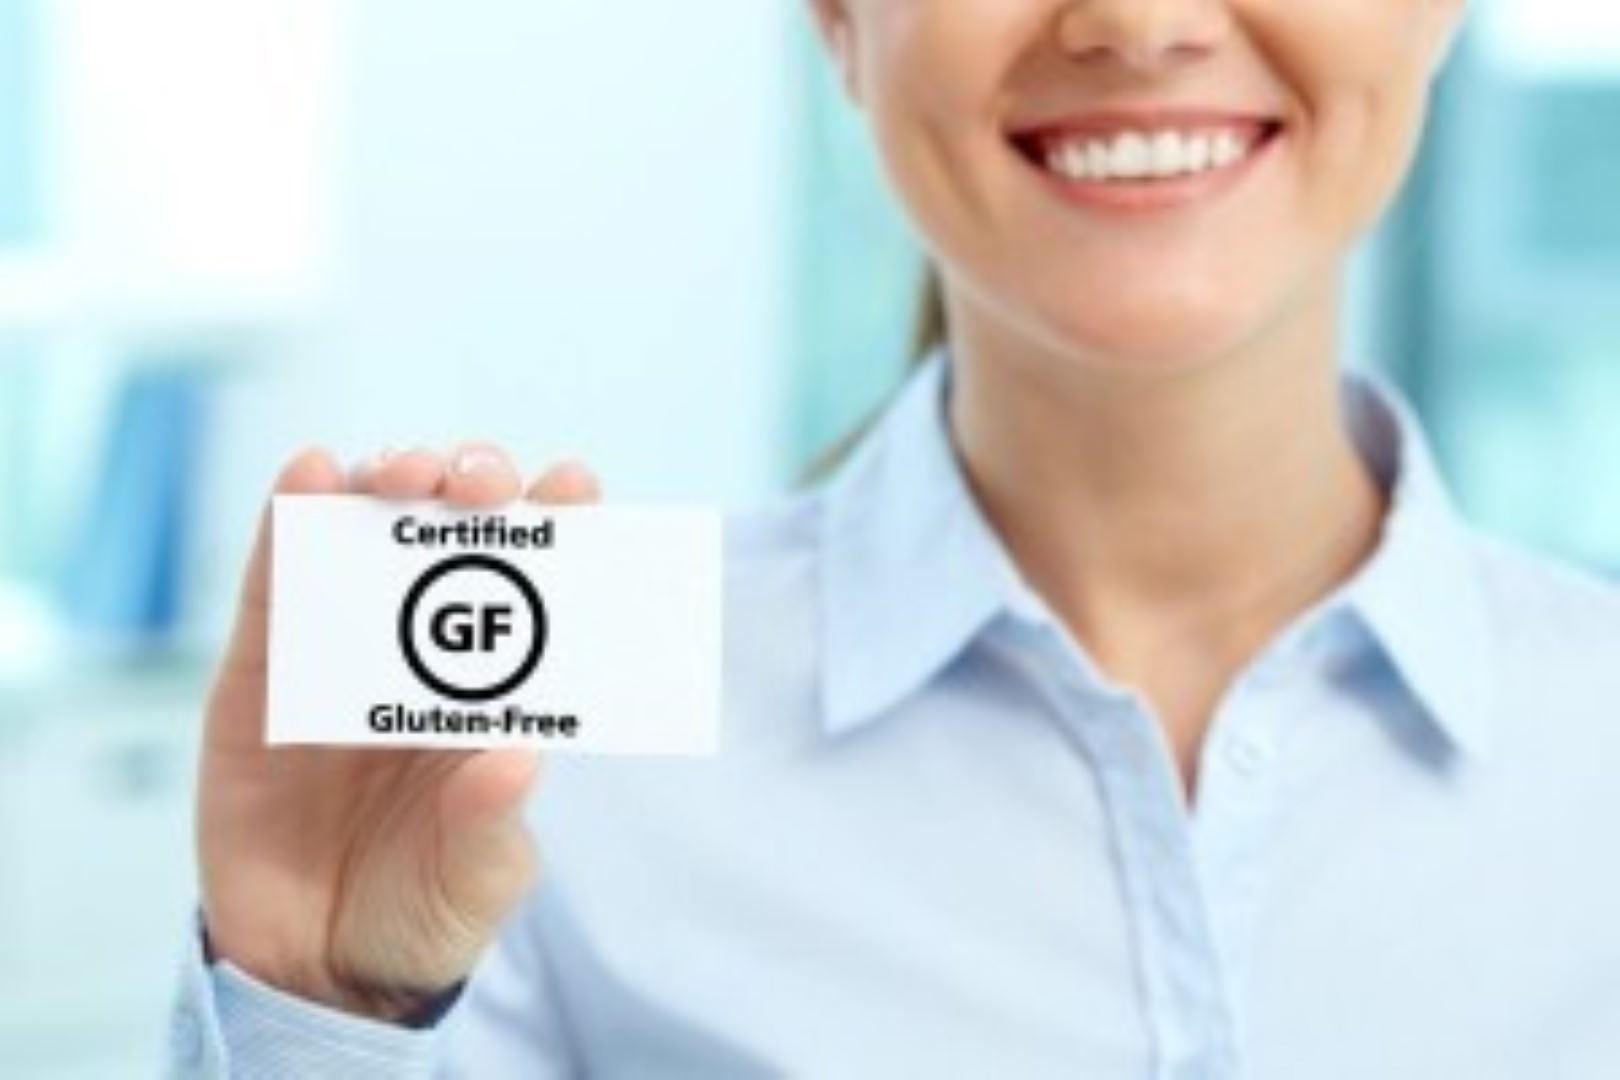 certified gluten free product